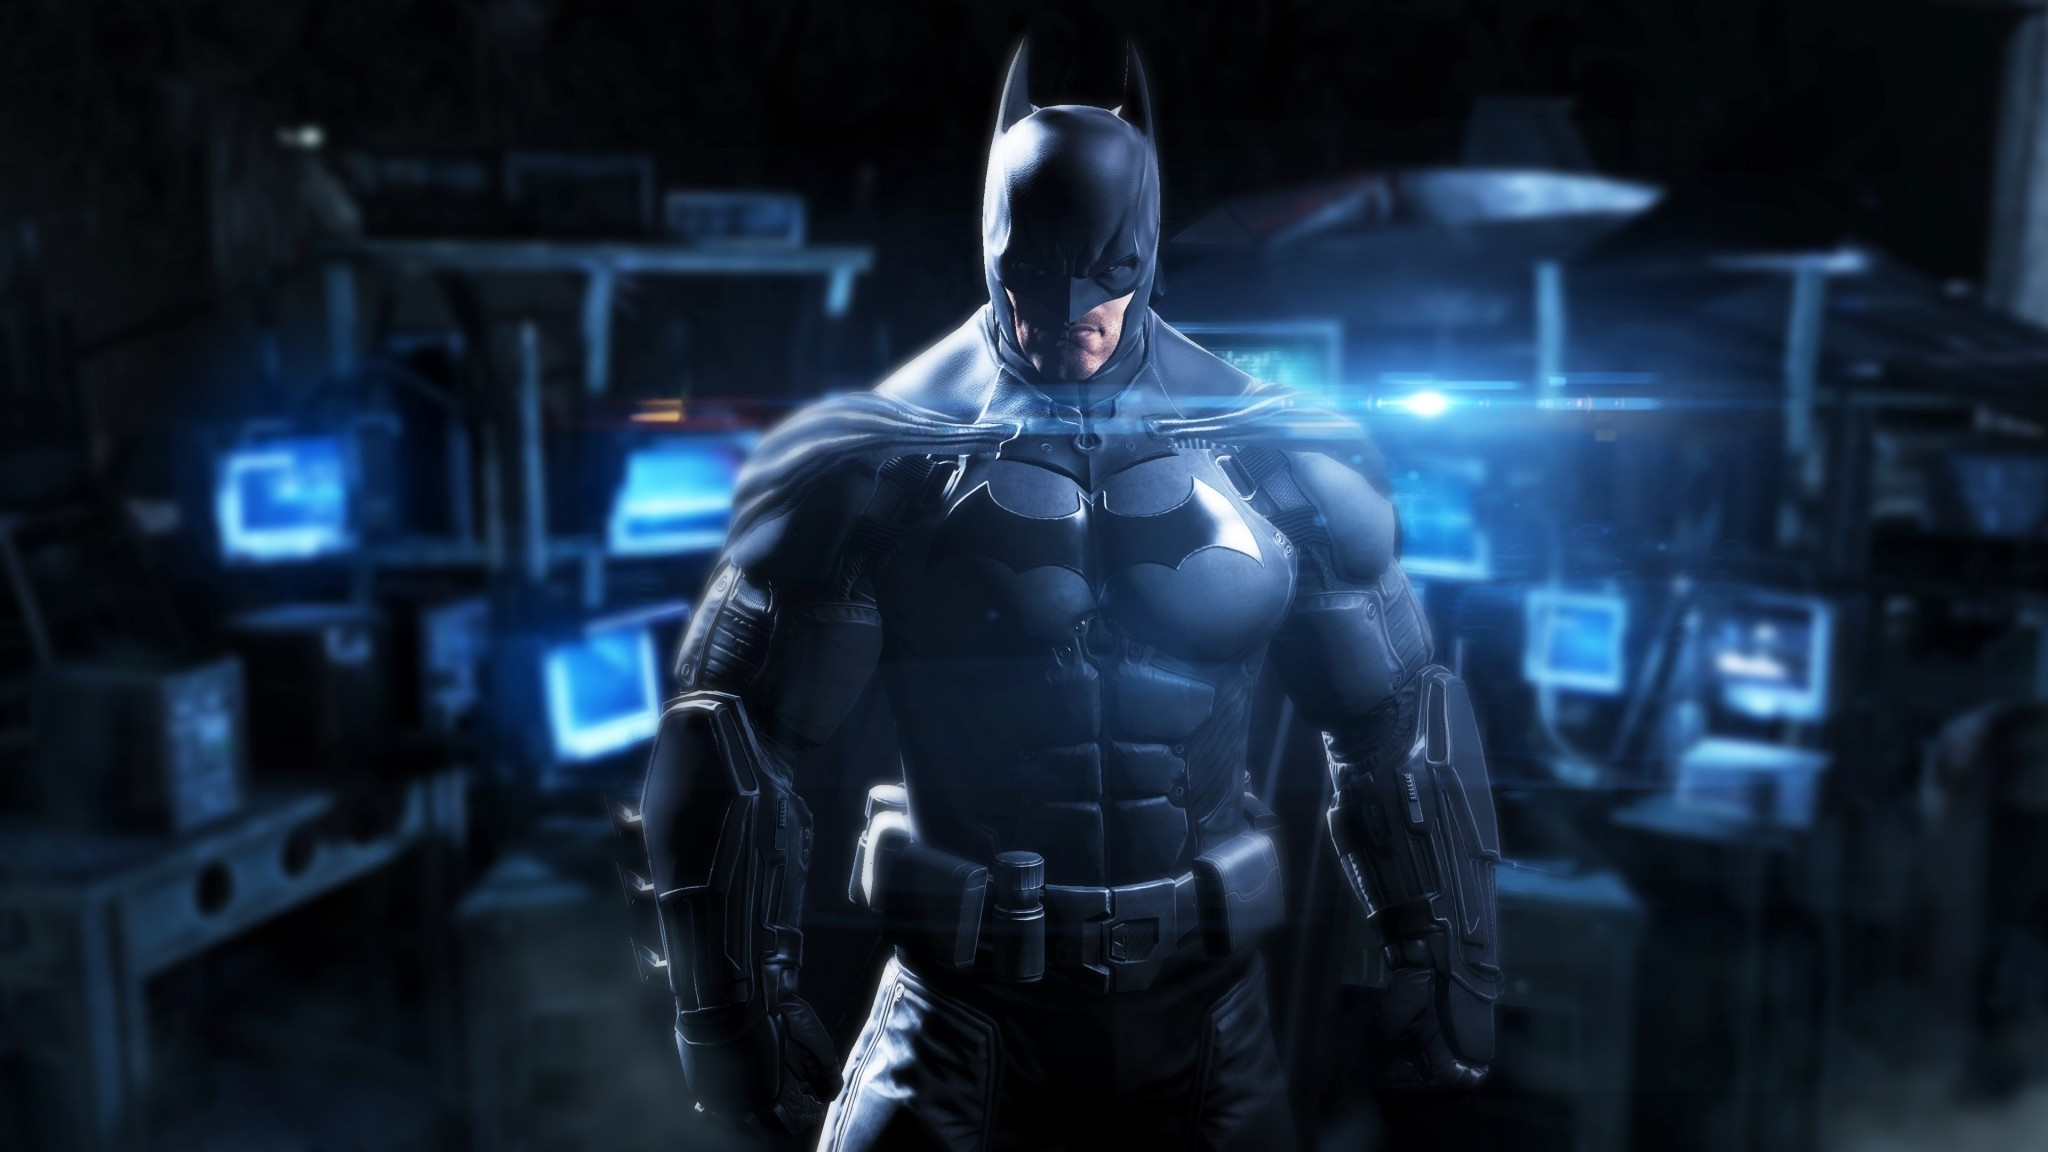 batman screensavers and backgrounds free